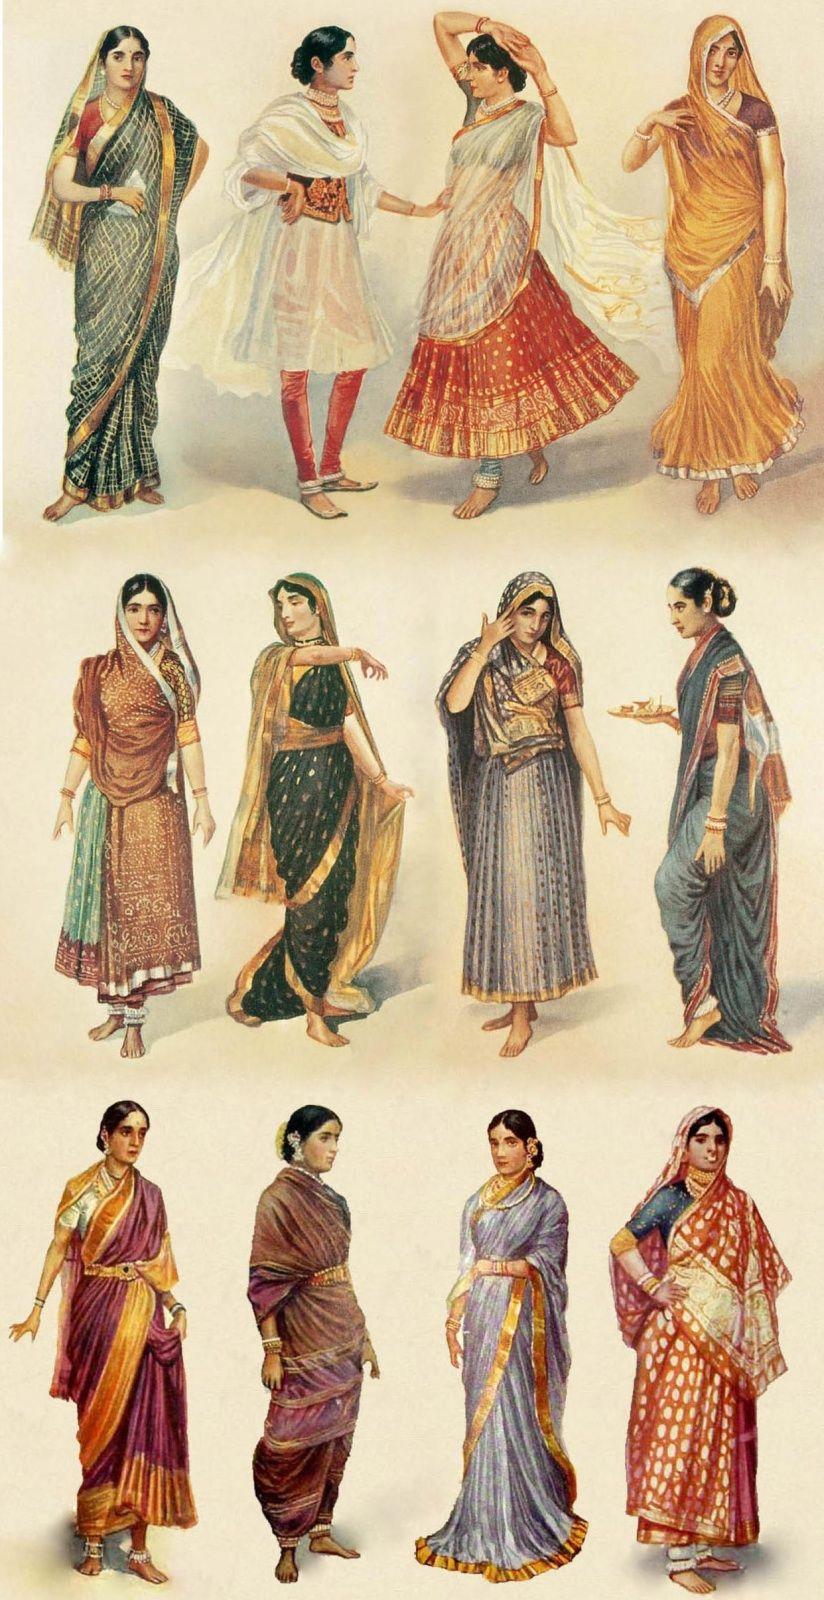 185bd84d3c This is how I dress. In India, we wear a traditional dress called Sari